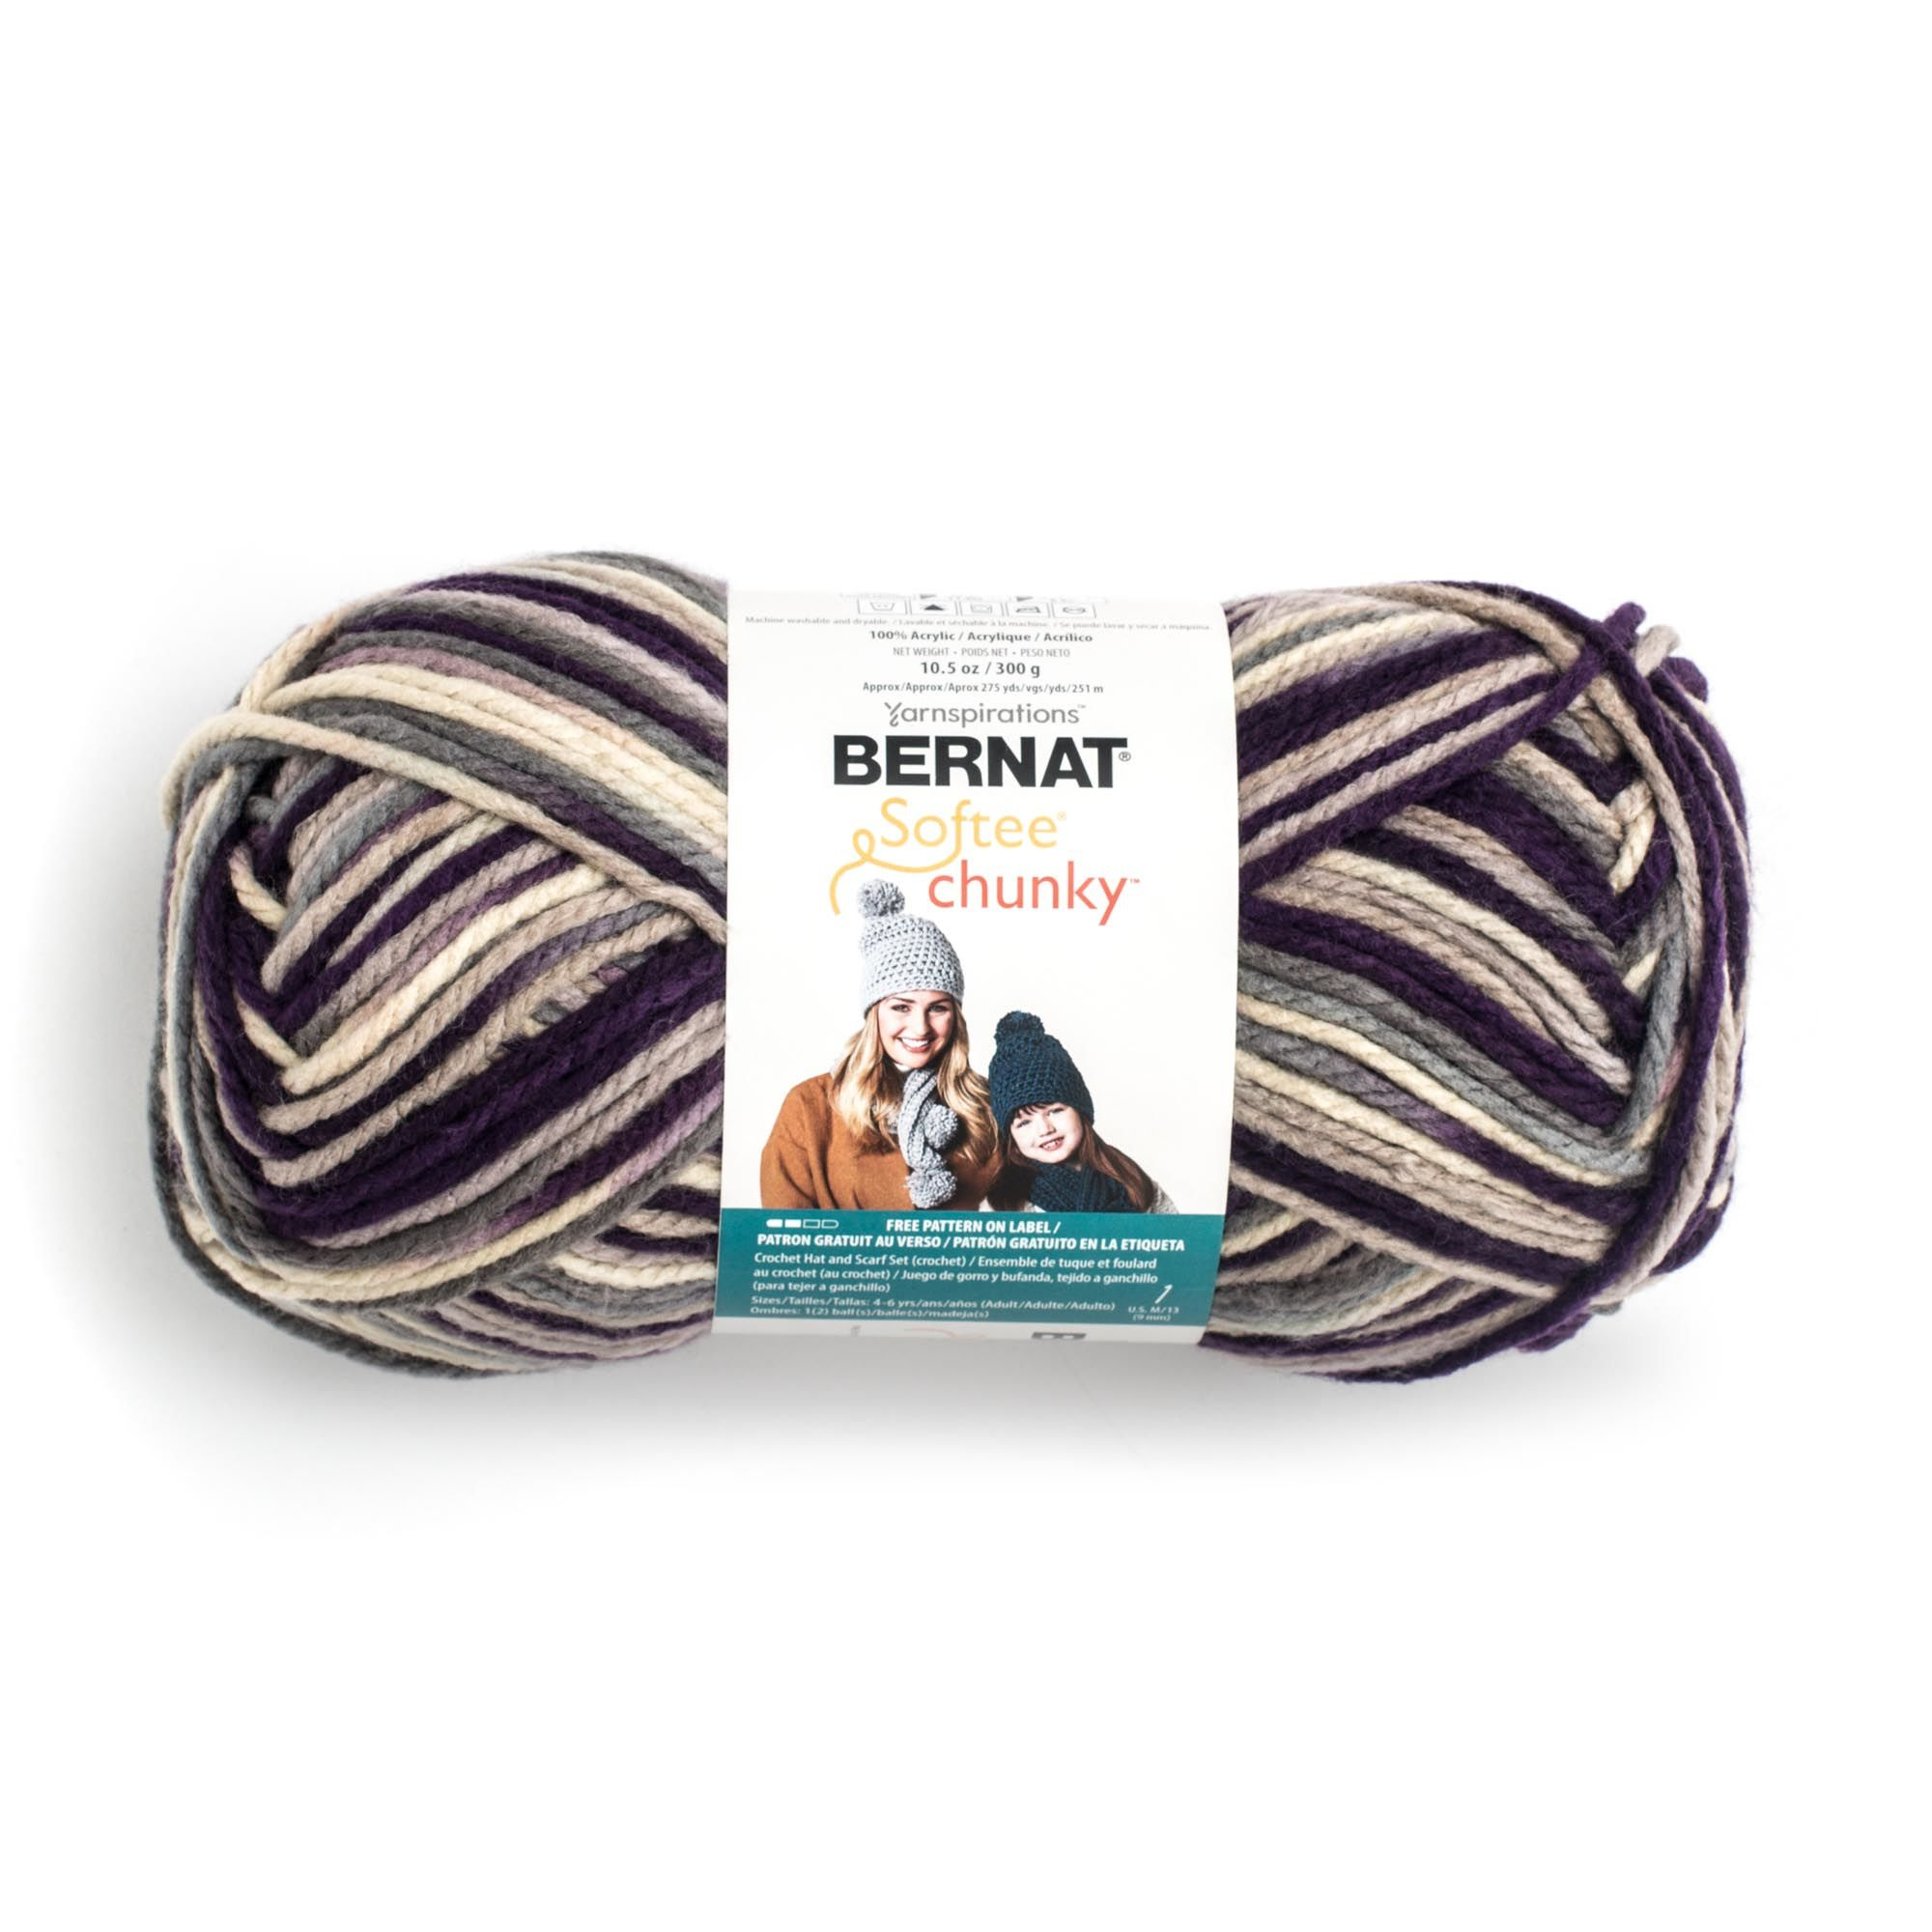 Bernat Softee Chunky Big Ball Yarn - Walmart.com